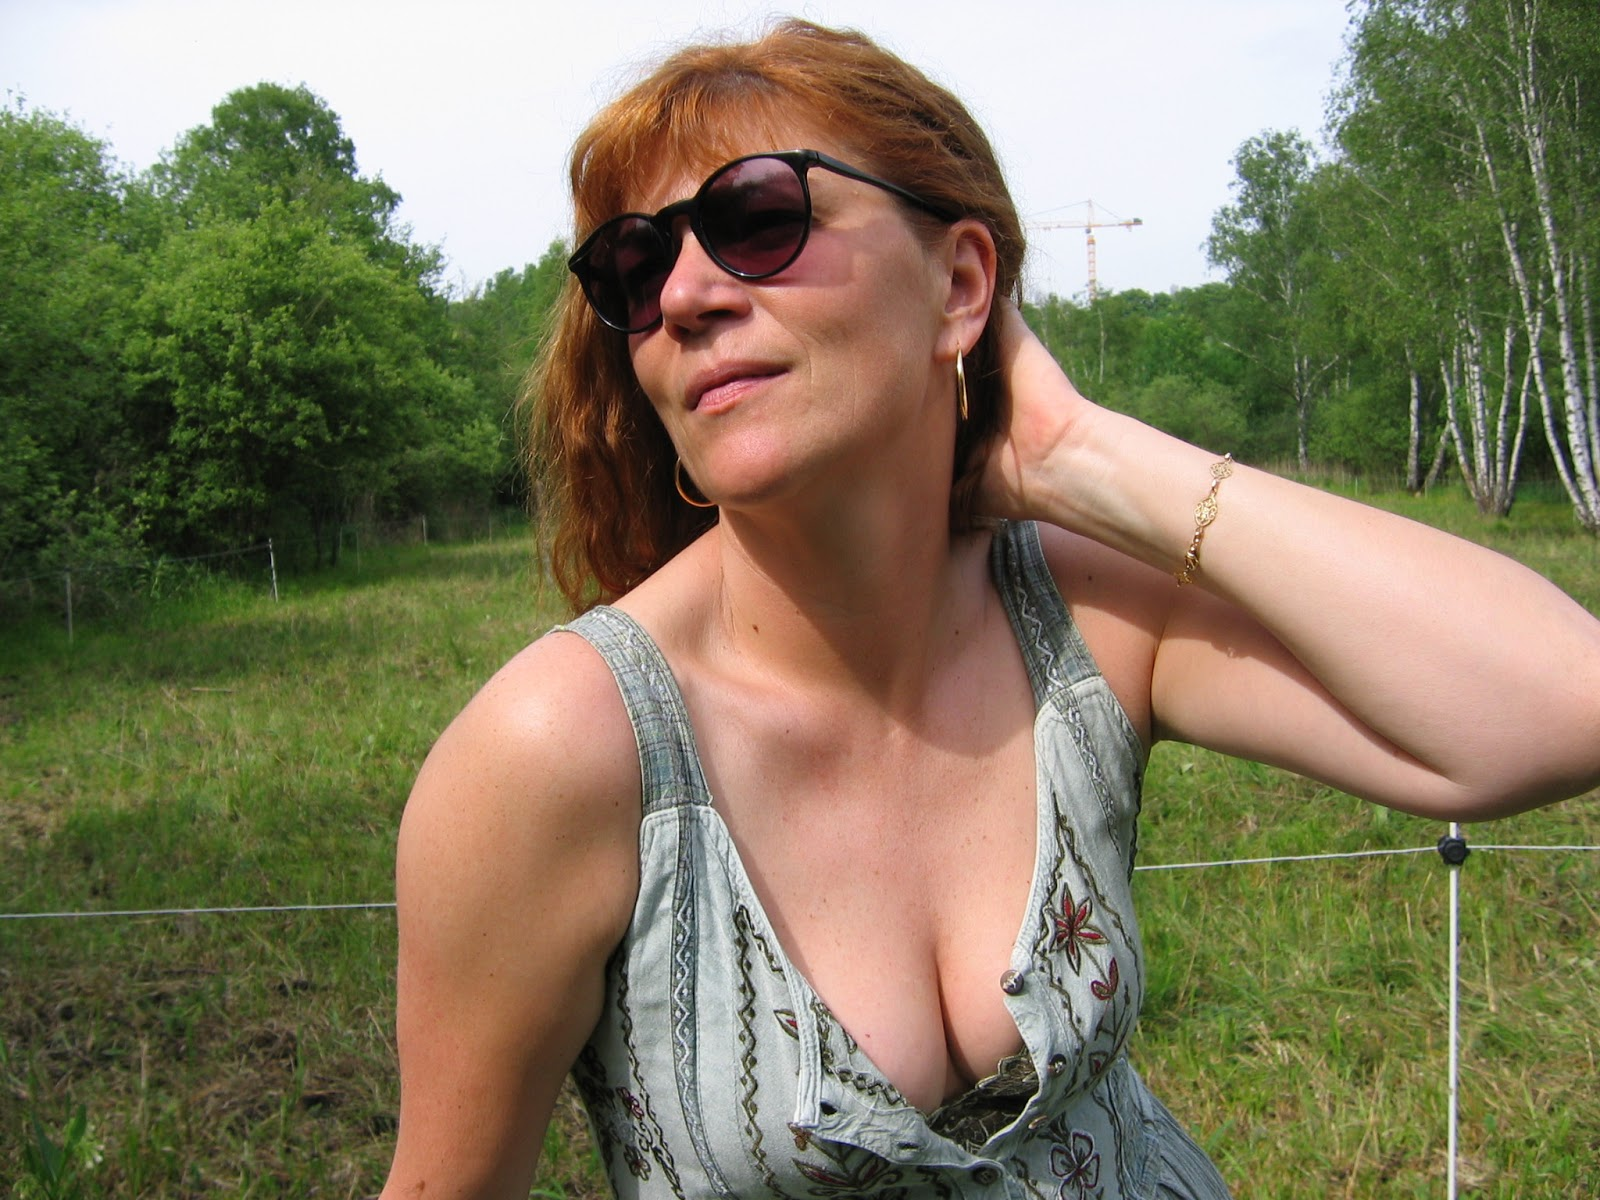 amateurs photos packs: sex photos of nathalie nice milf from france